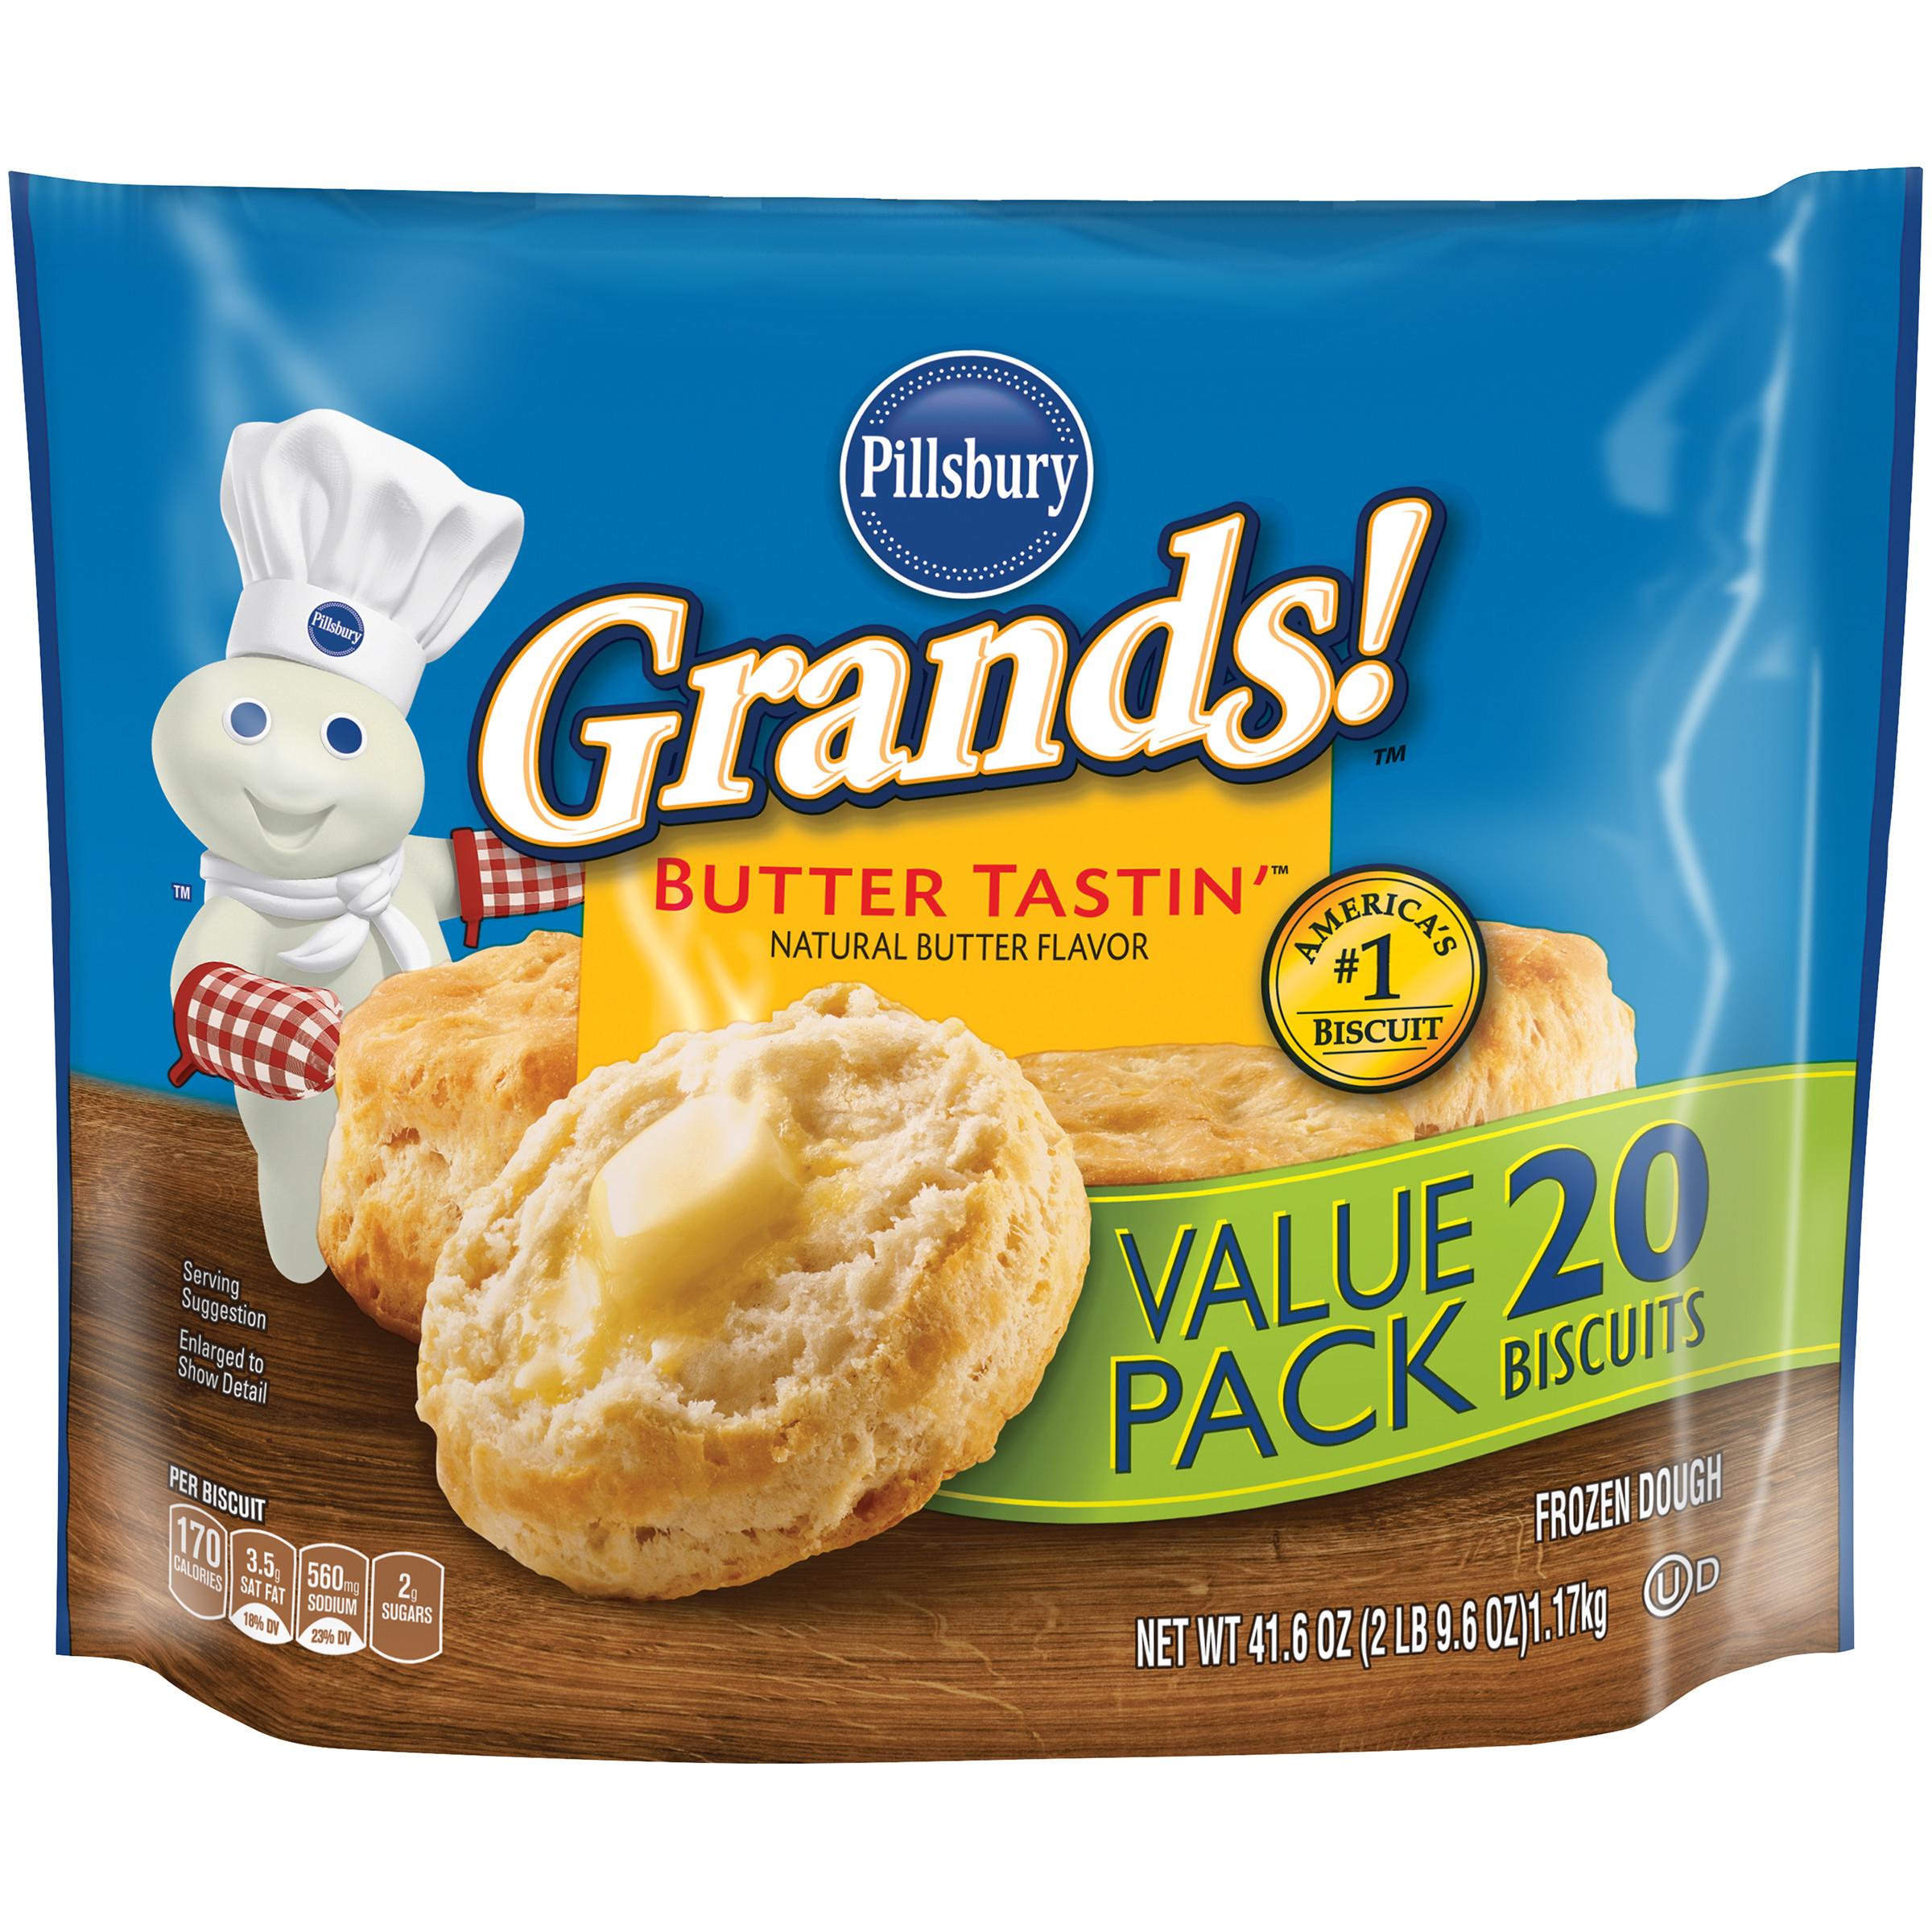 Pillsbury Halloween Cookies Walmart  Pillsbury Ready to Bake Sugar Cookies 24 ct Pack